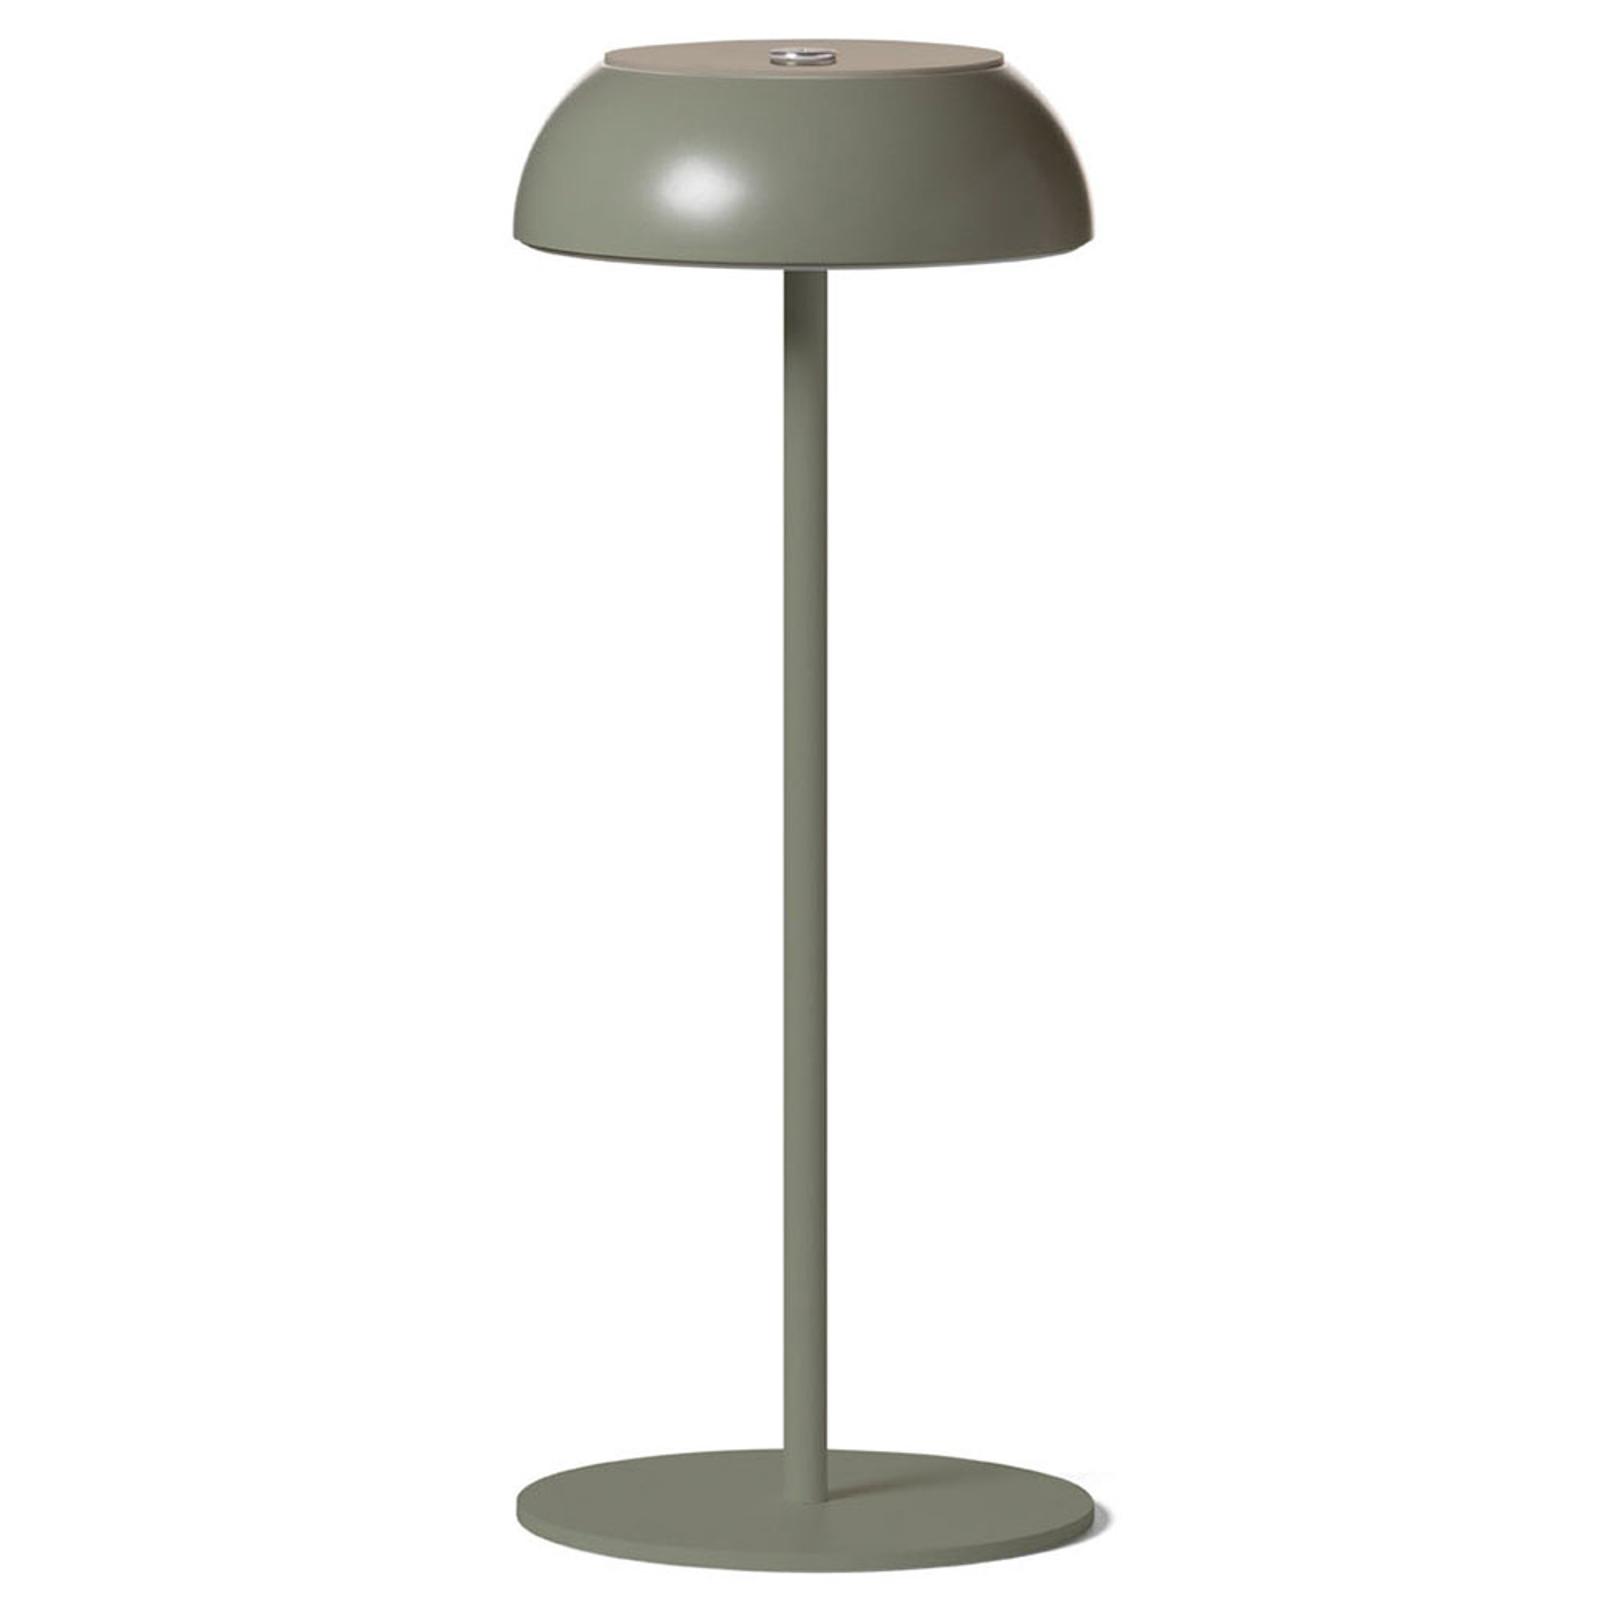 Axolight Float LED-Designer-Tischleuchte, grün